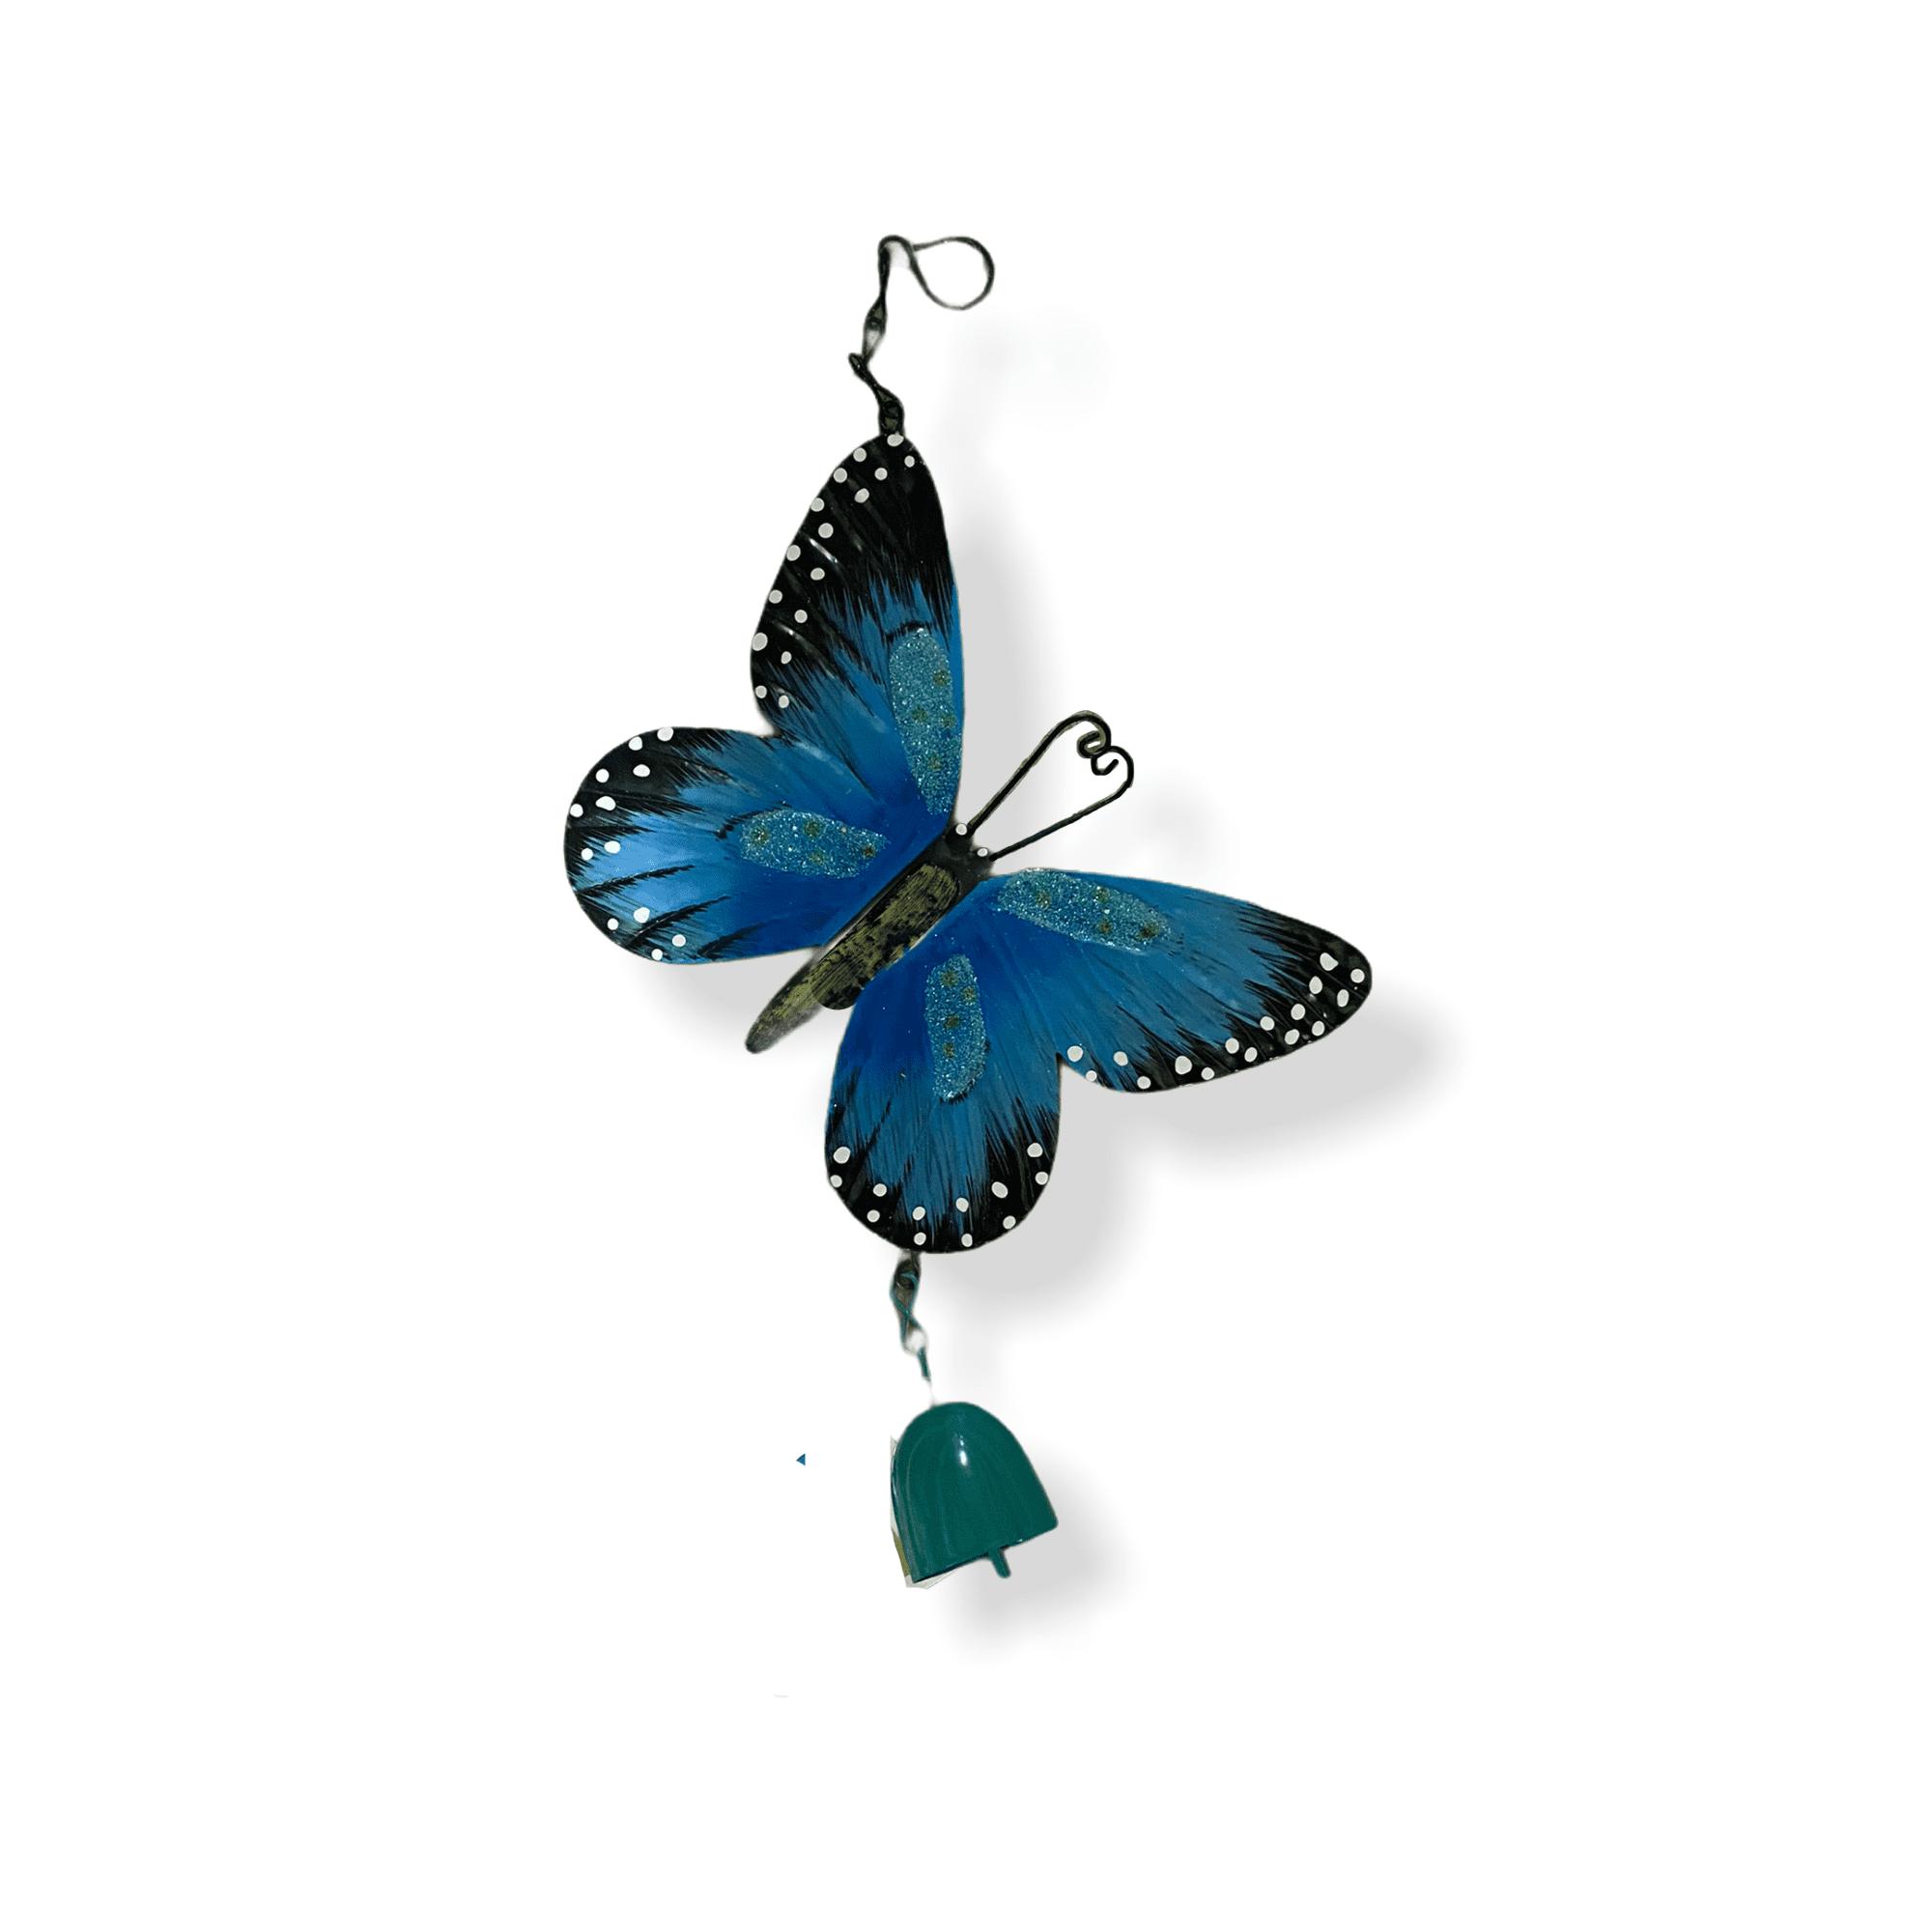 Gartenhänger Schmetterling  blau